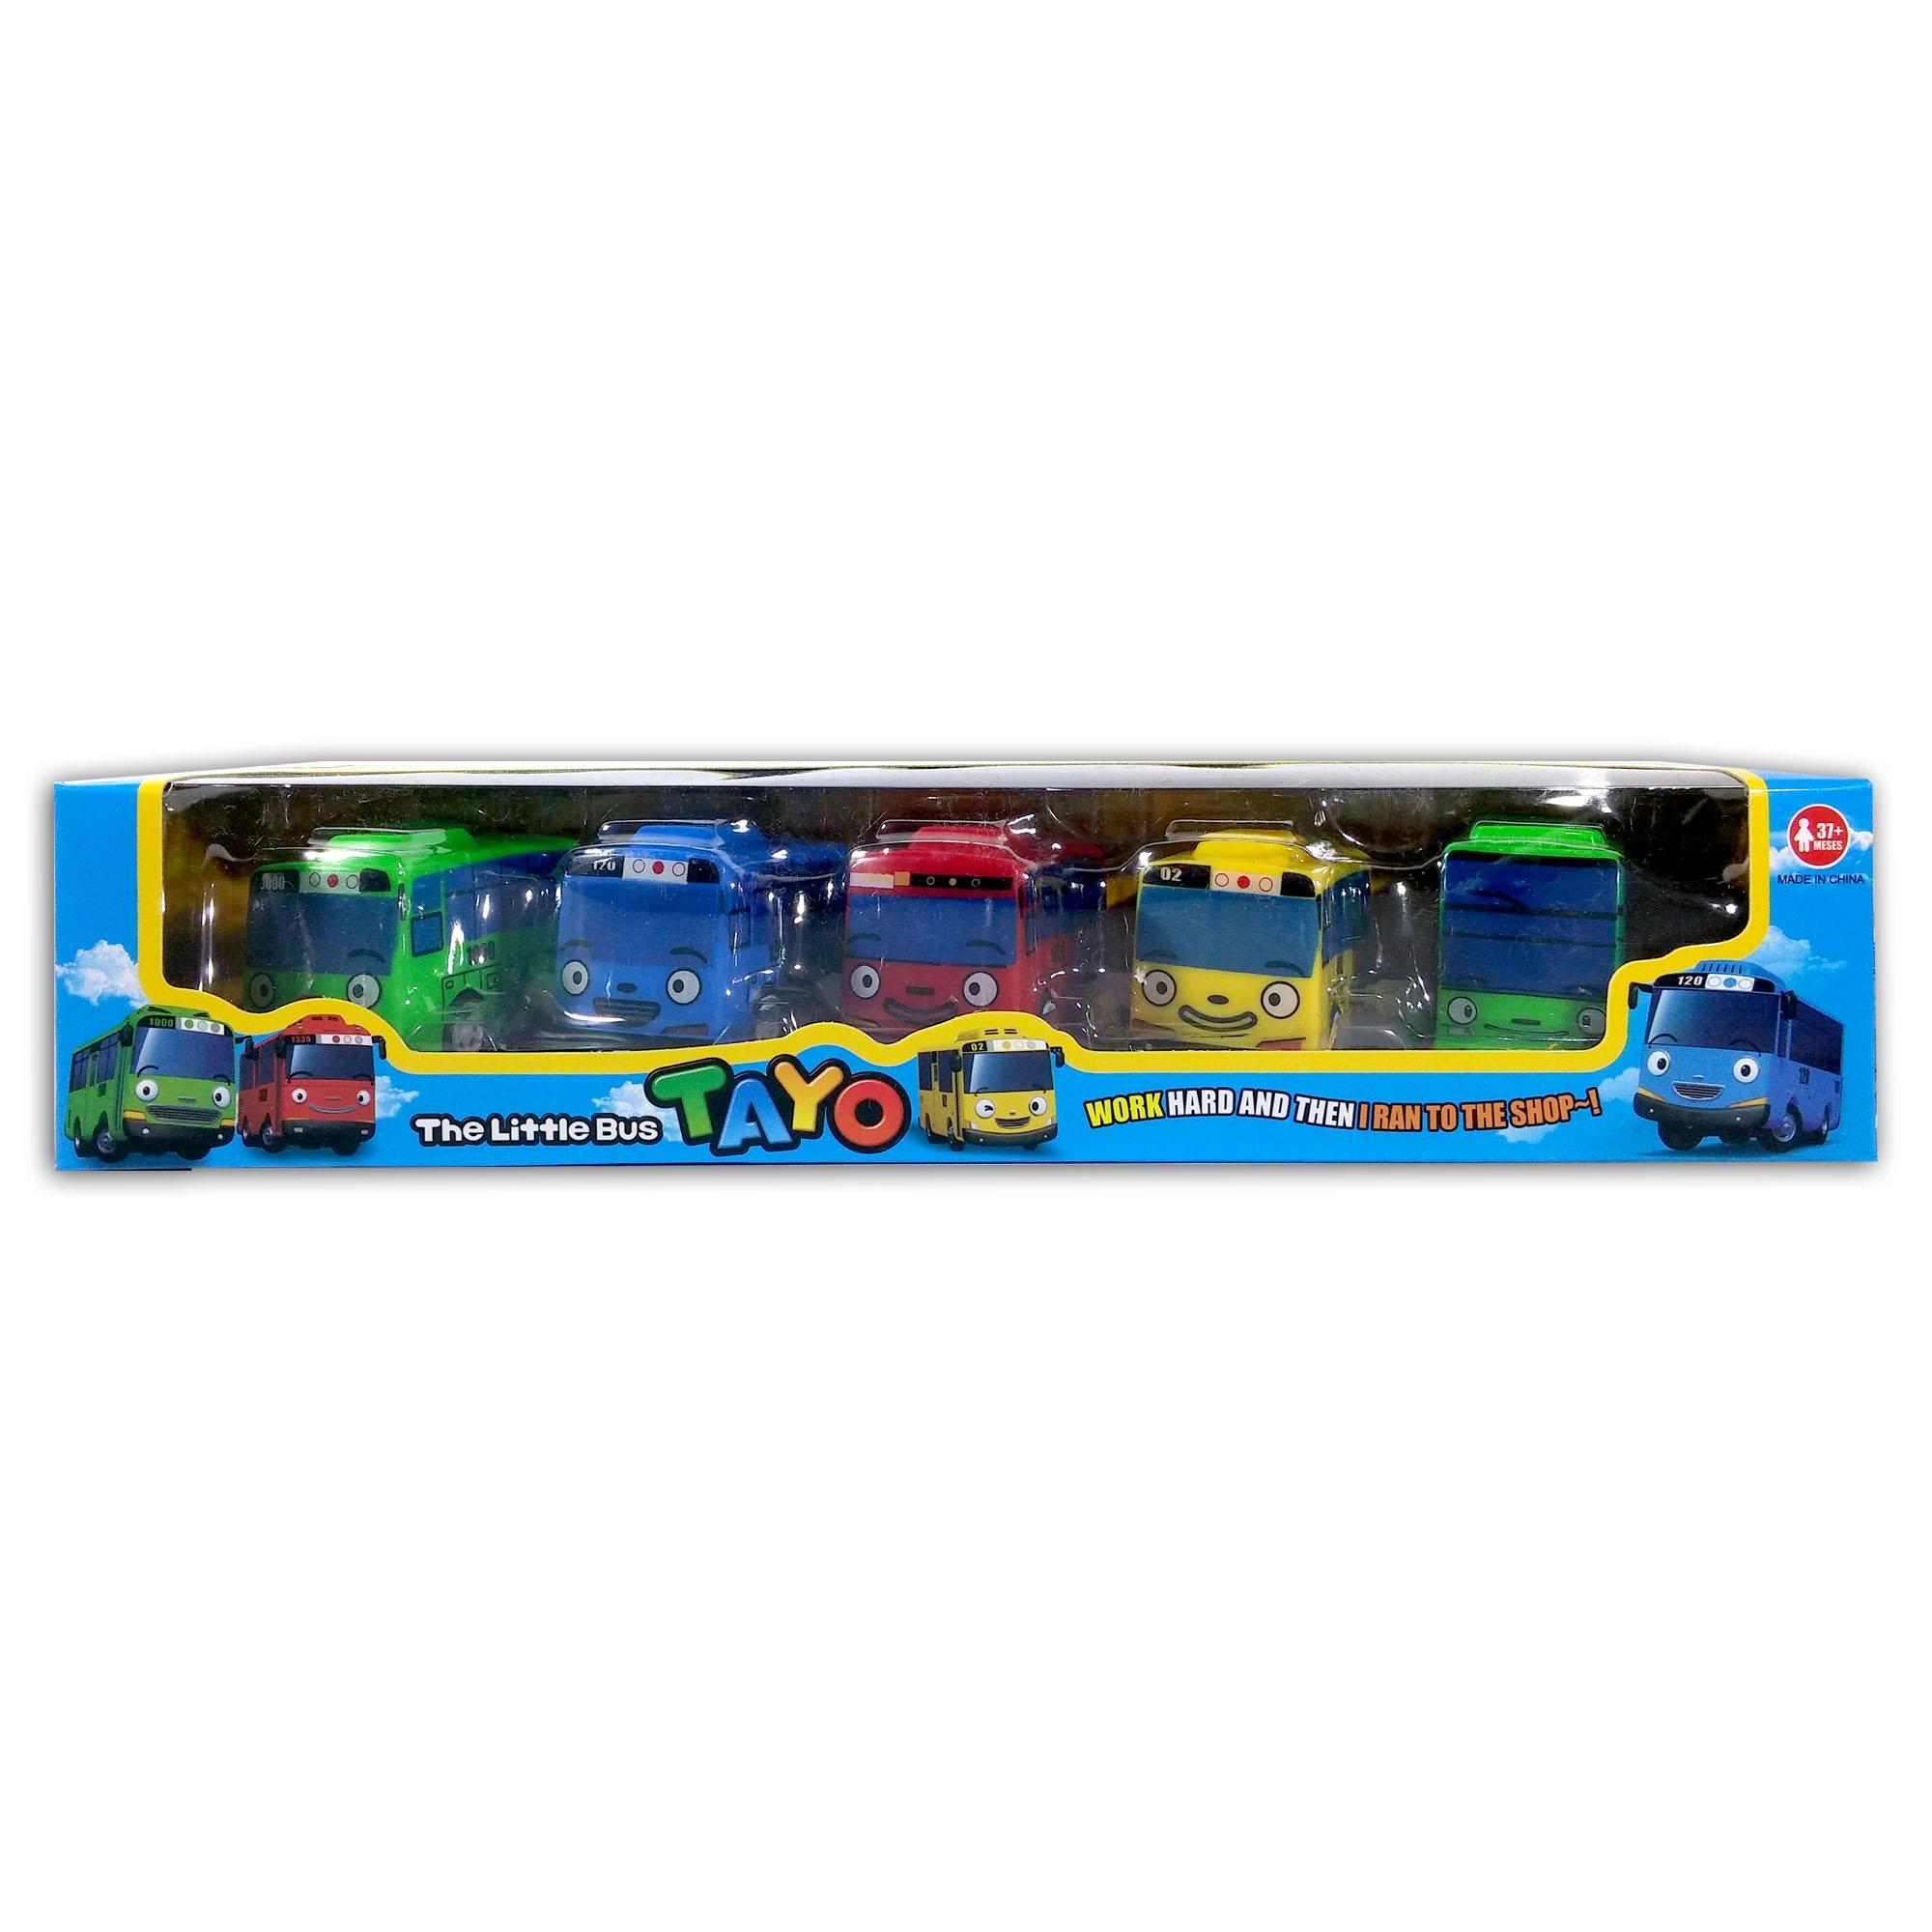 Fio Online - Tayo The Little Bus 1 set 5 pcs - Play Set Mainan Anak 4b134aeda7